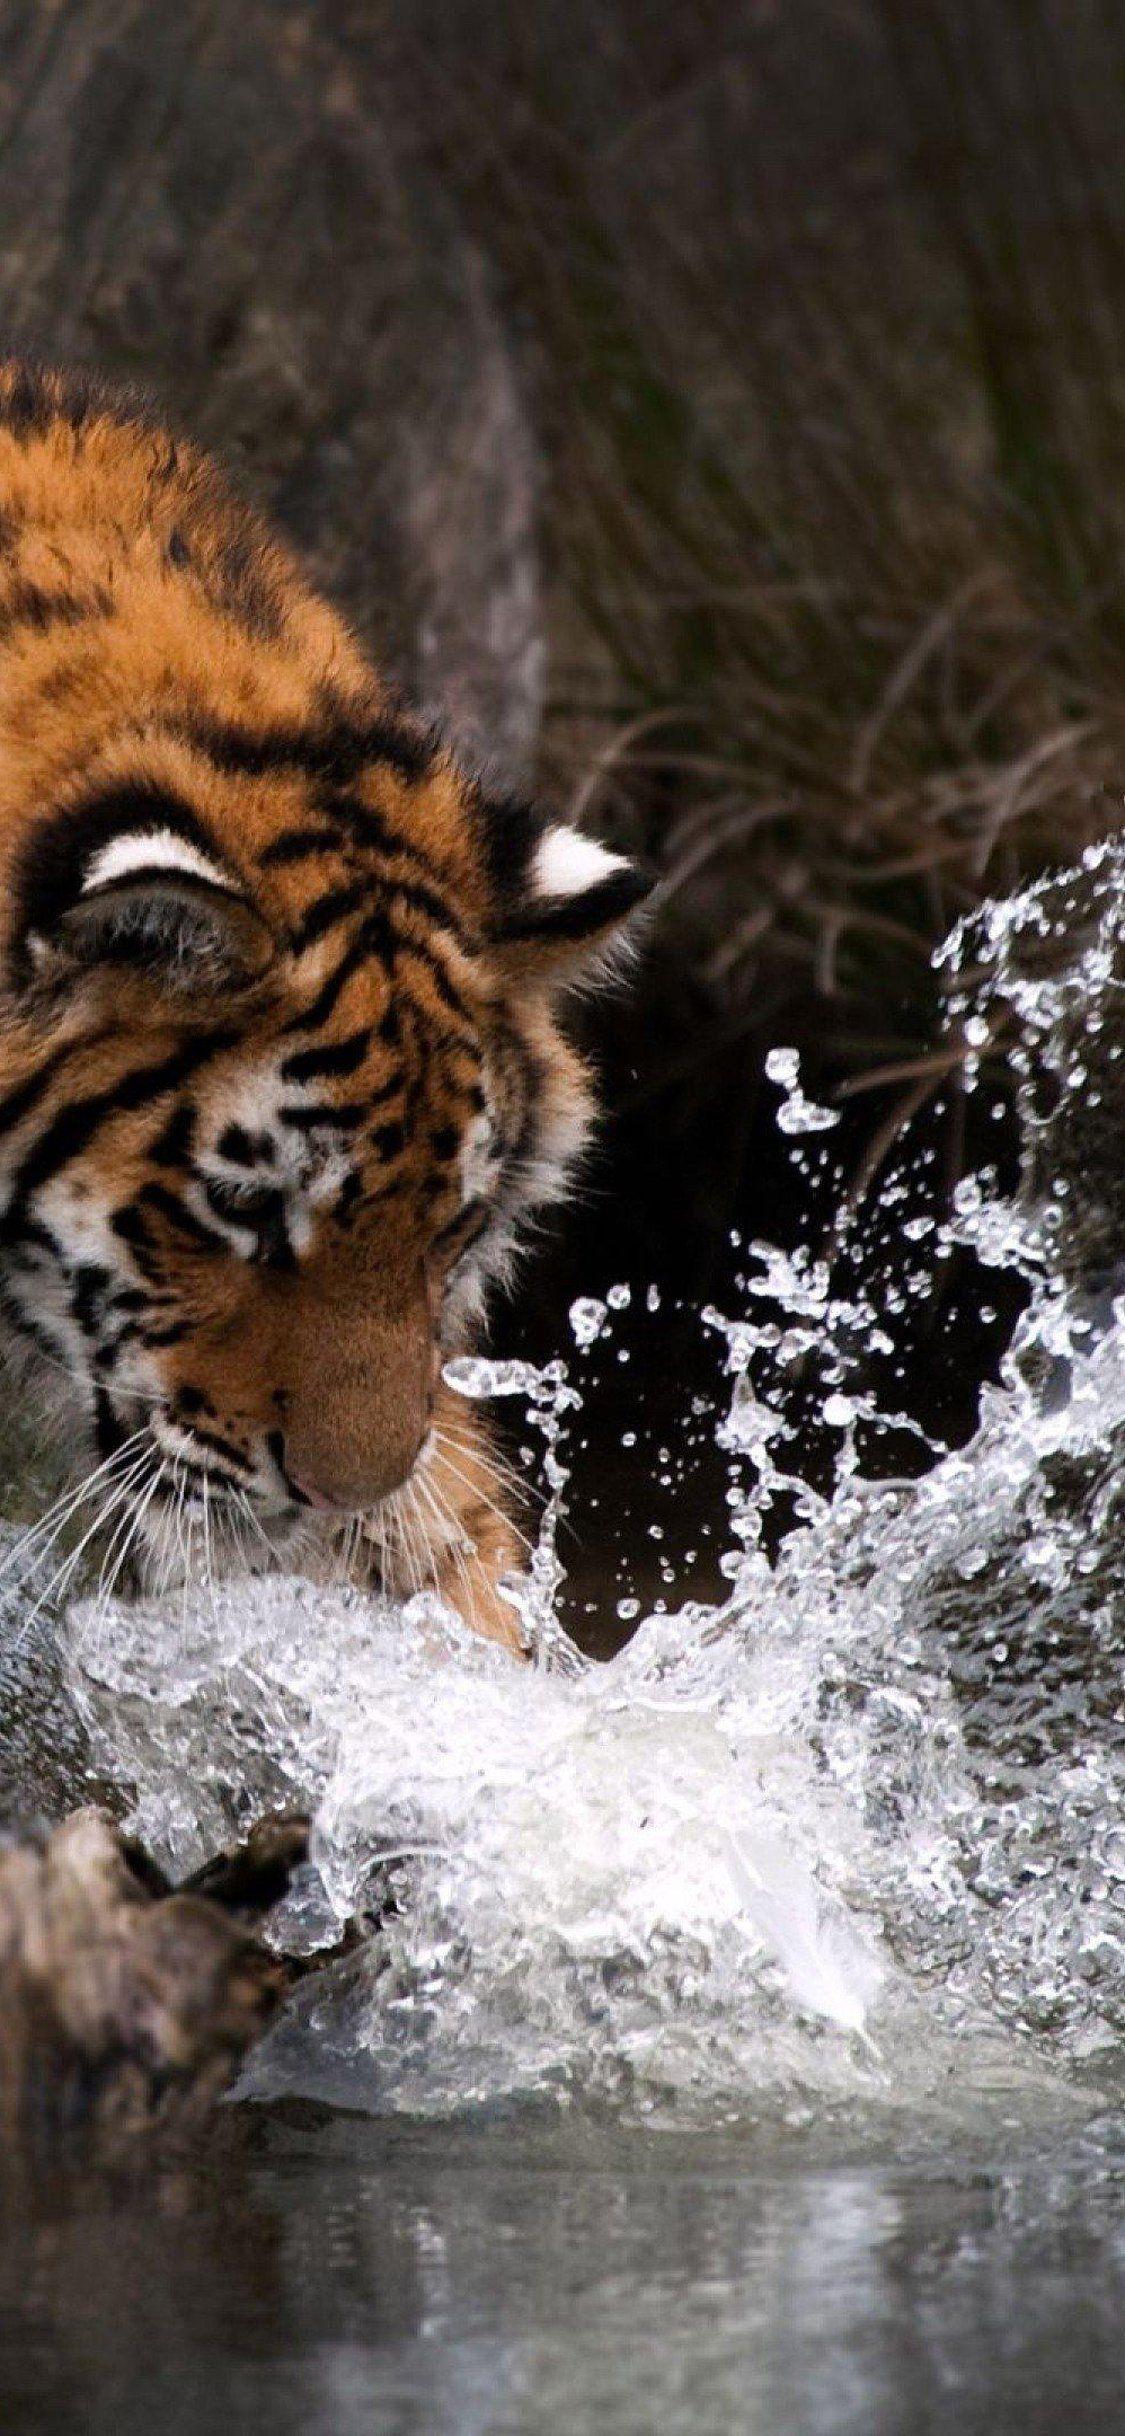 Download Sumatran tiger, Water, Big cats for iPhone X